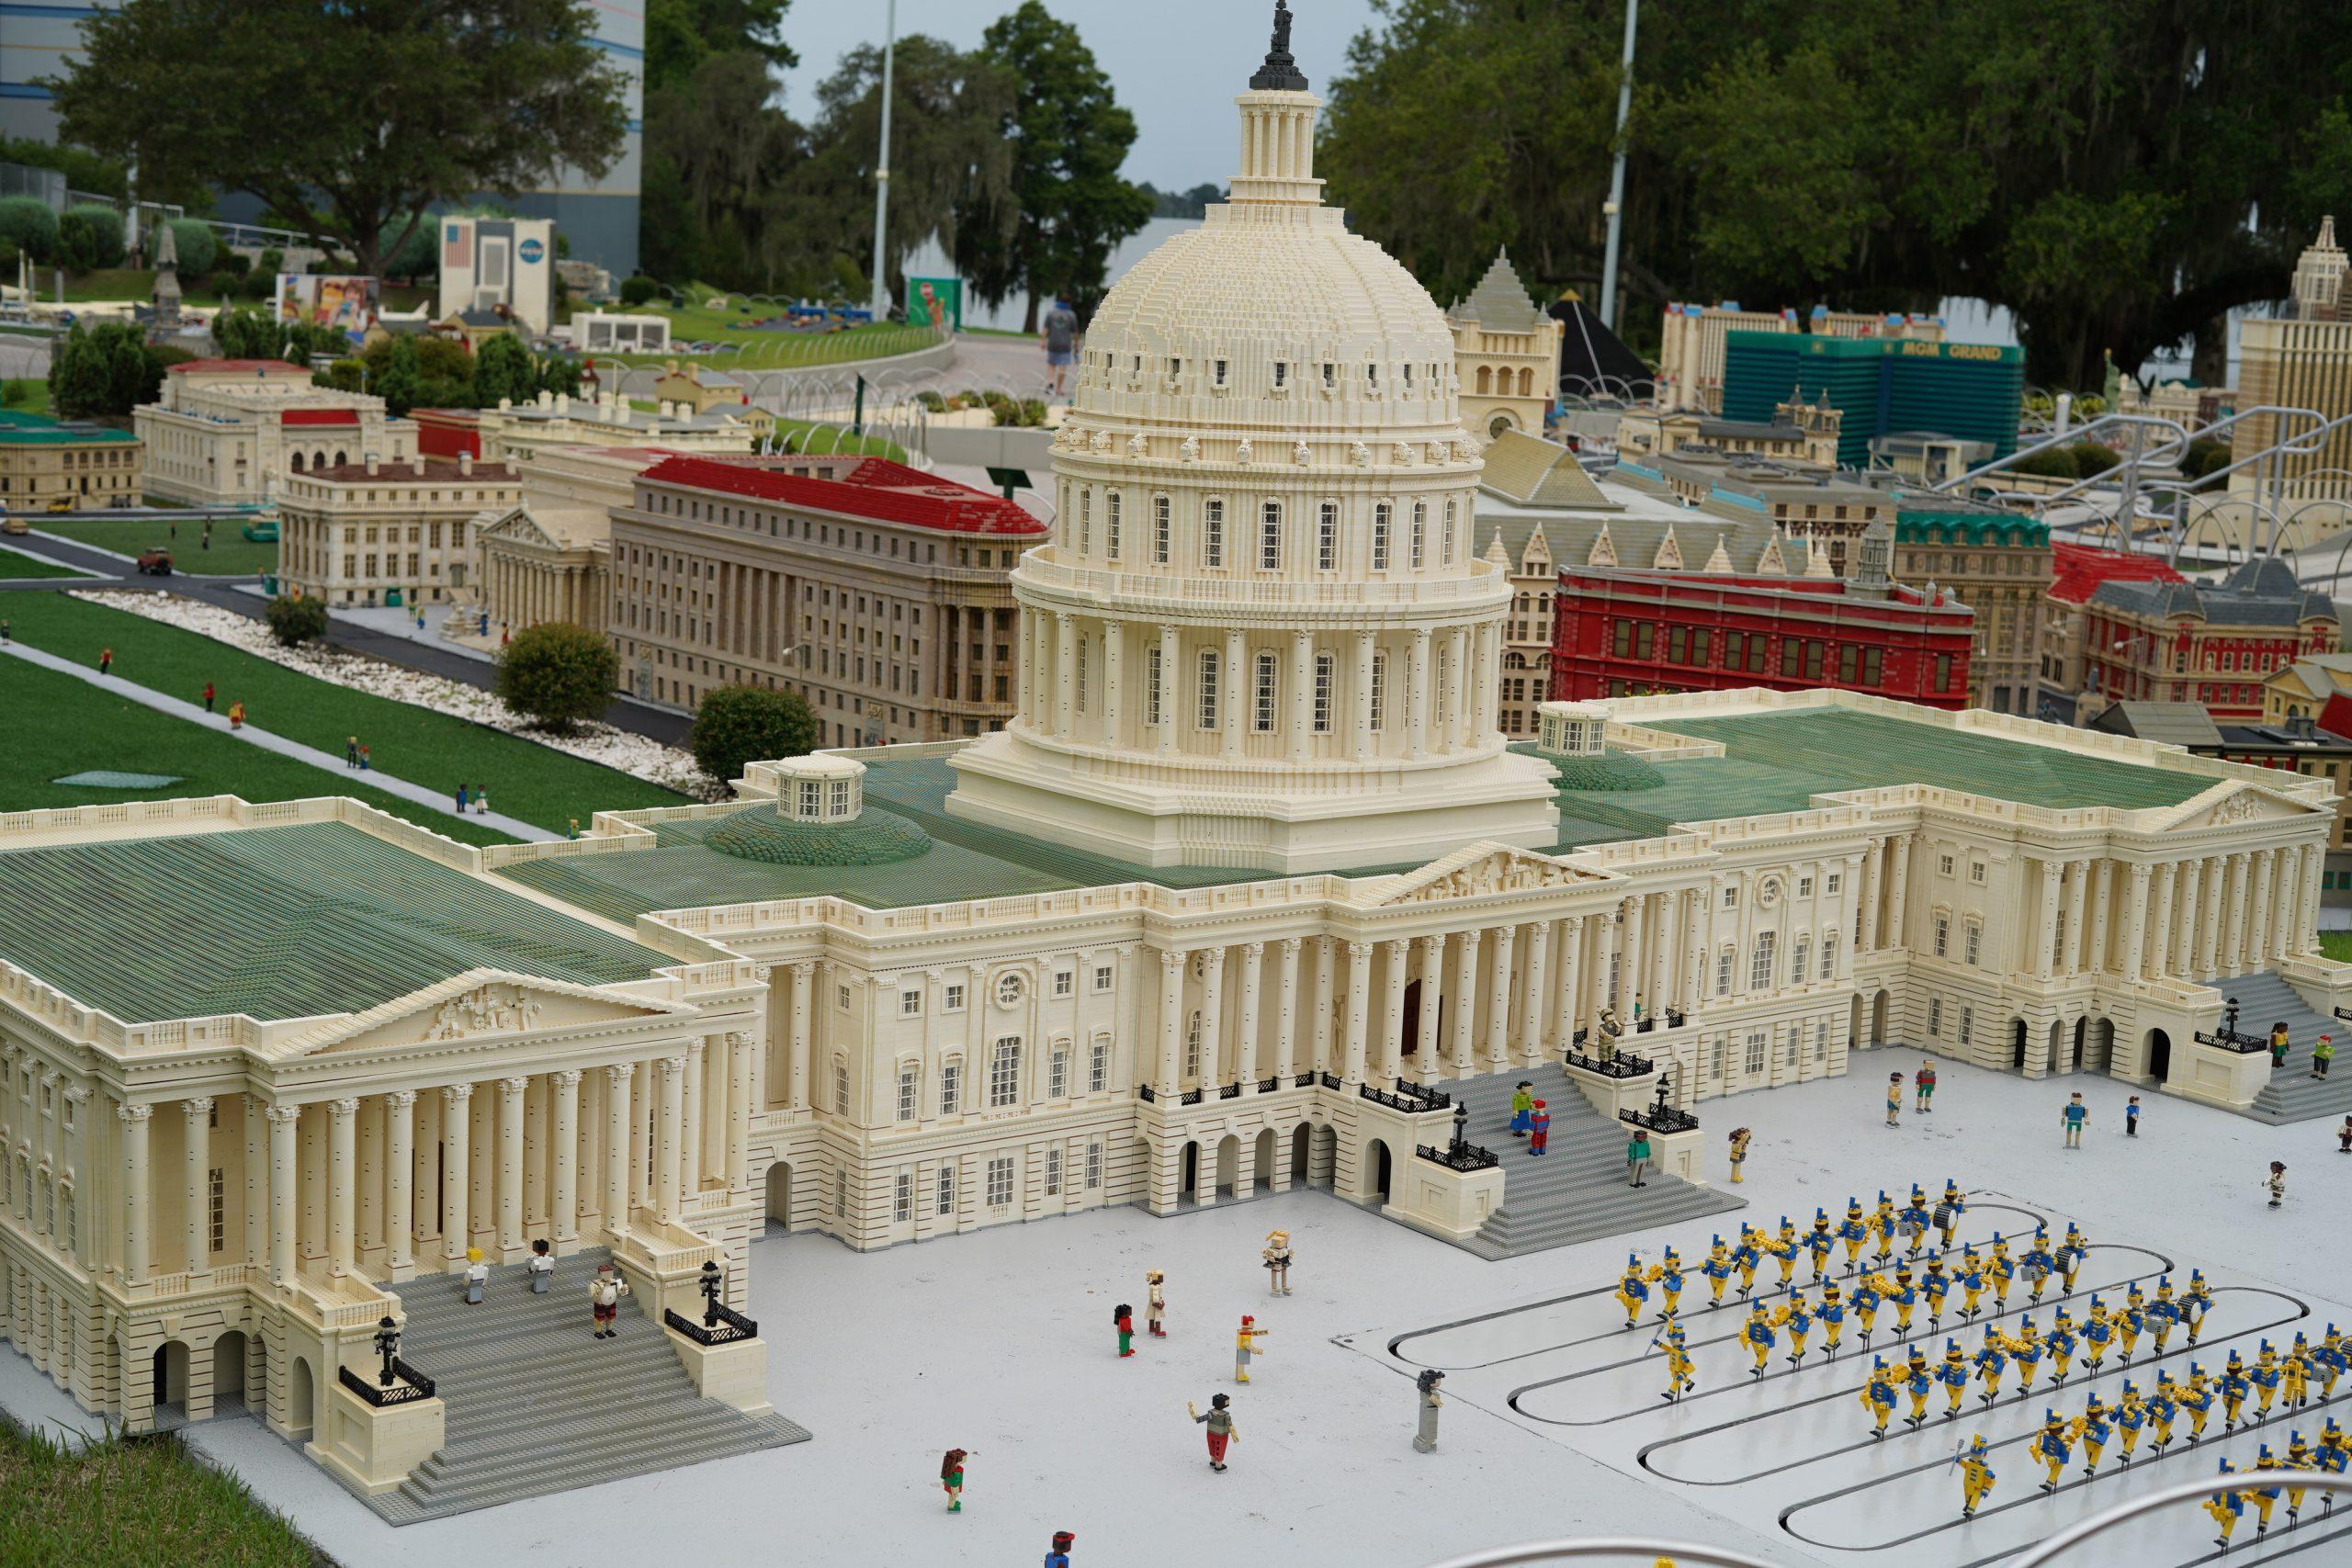 Lego White House in Miniland in LEGOLAND.  | Guide to LEGOLAND Florida